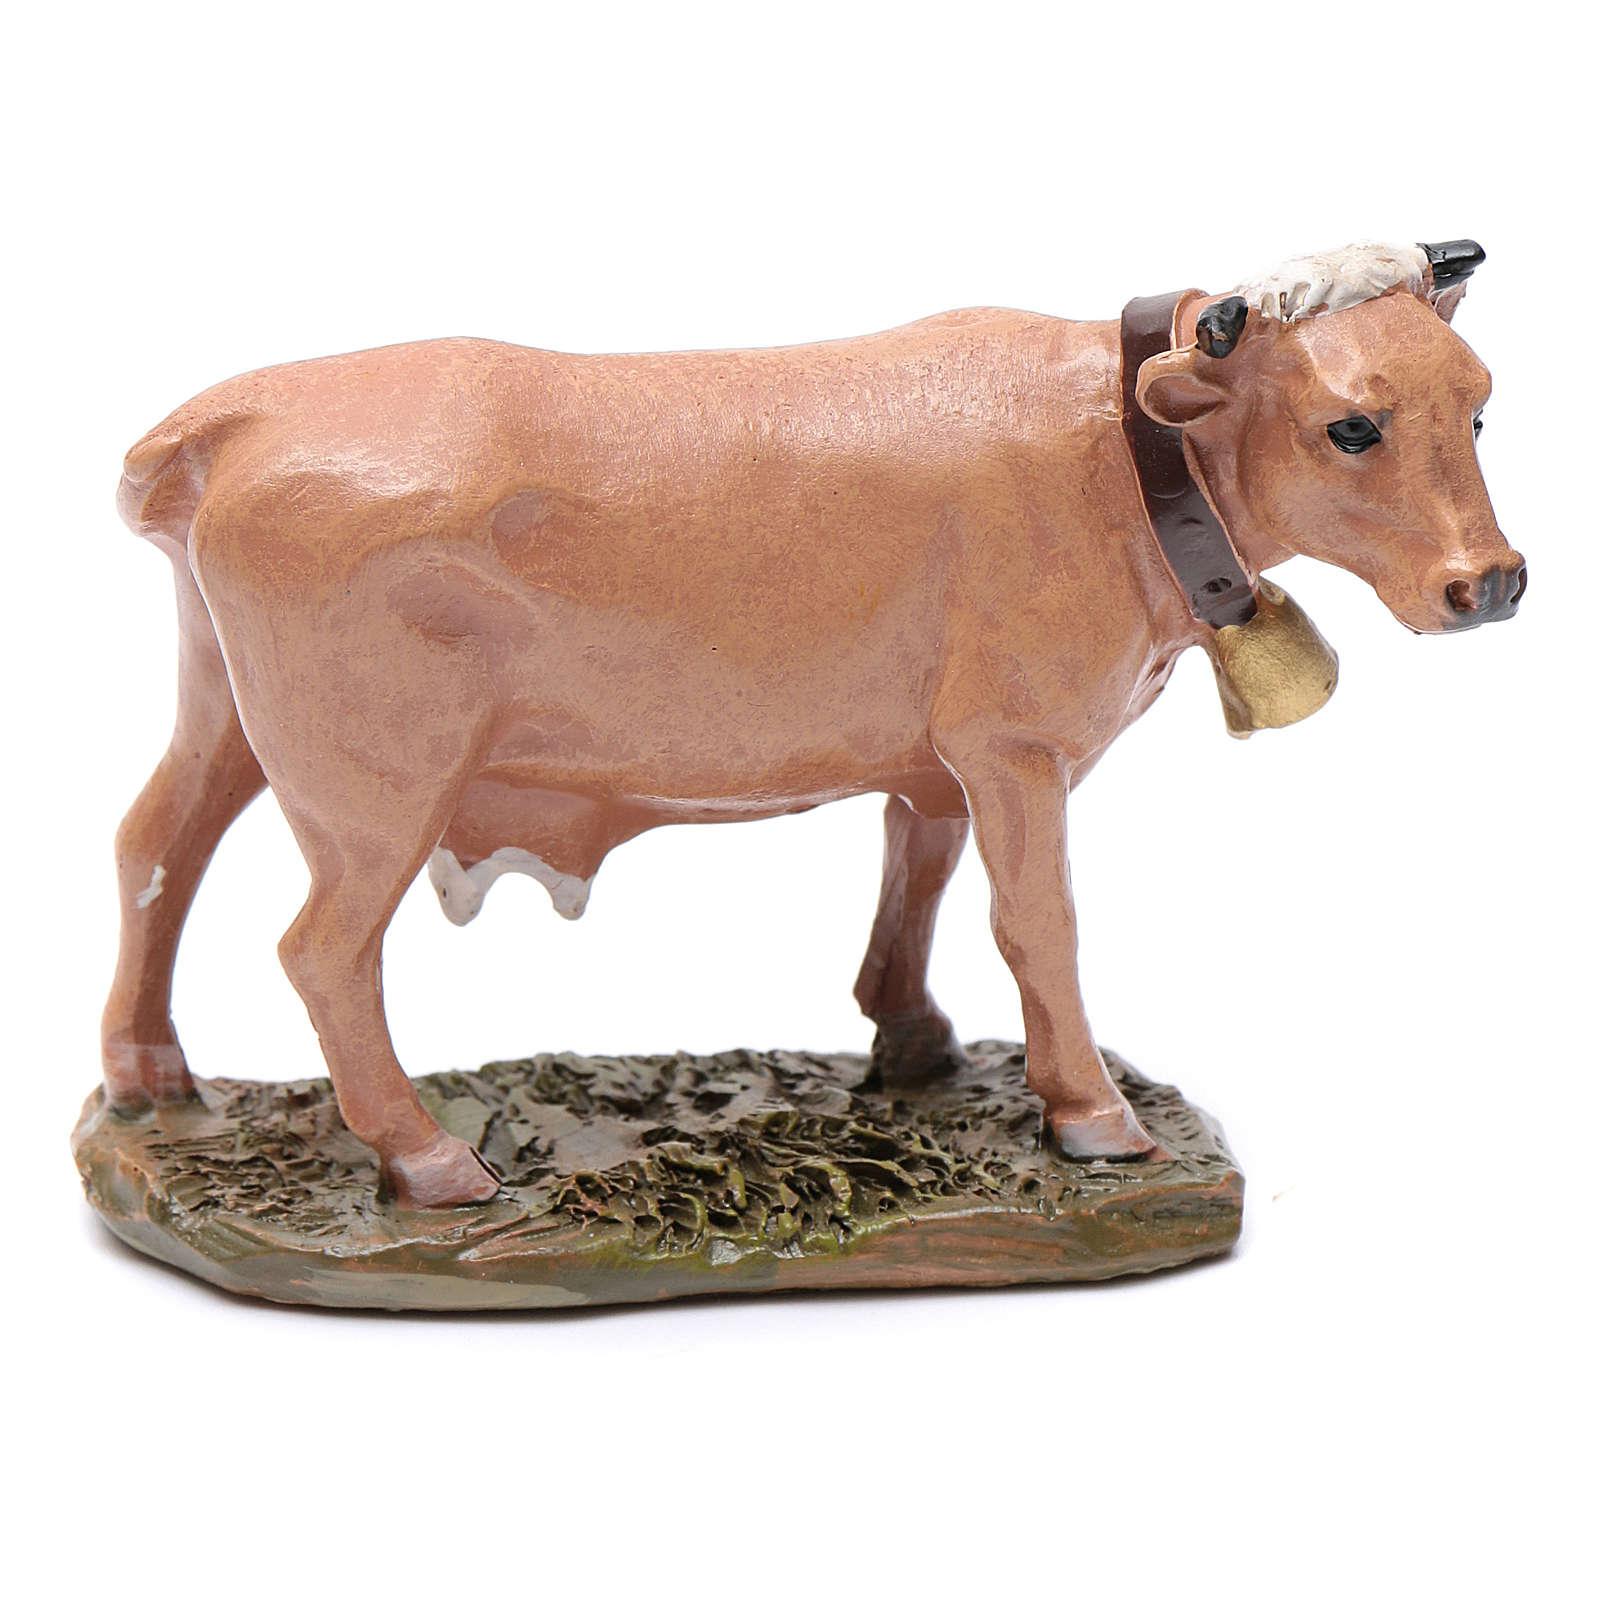 Mucca in resina per presepe 10 cm Linea Martino Landi 3